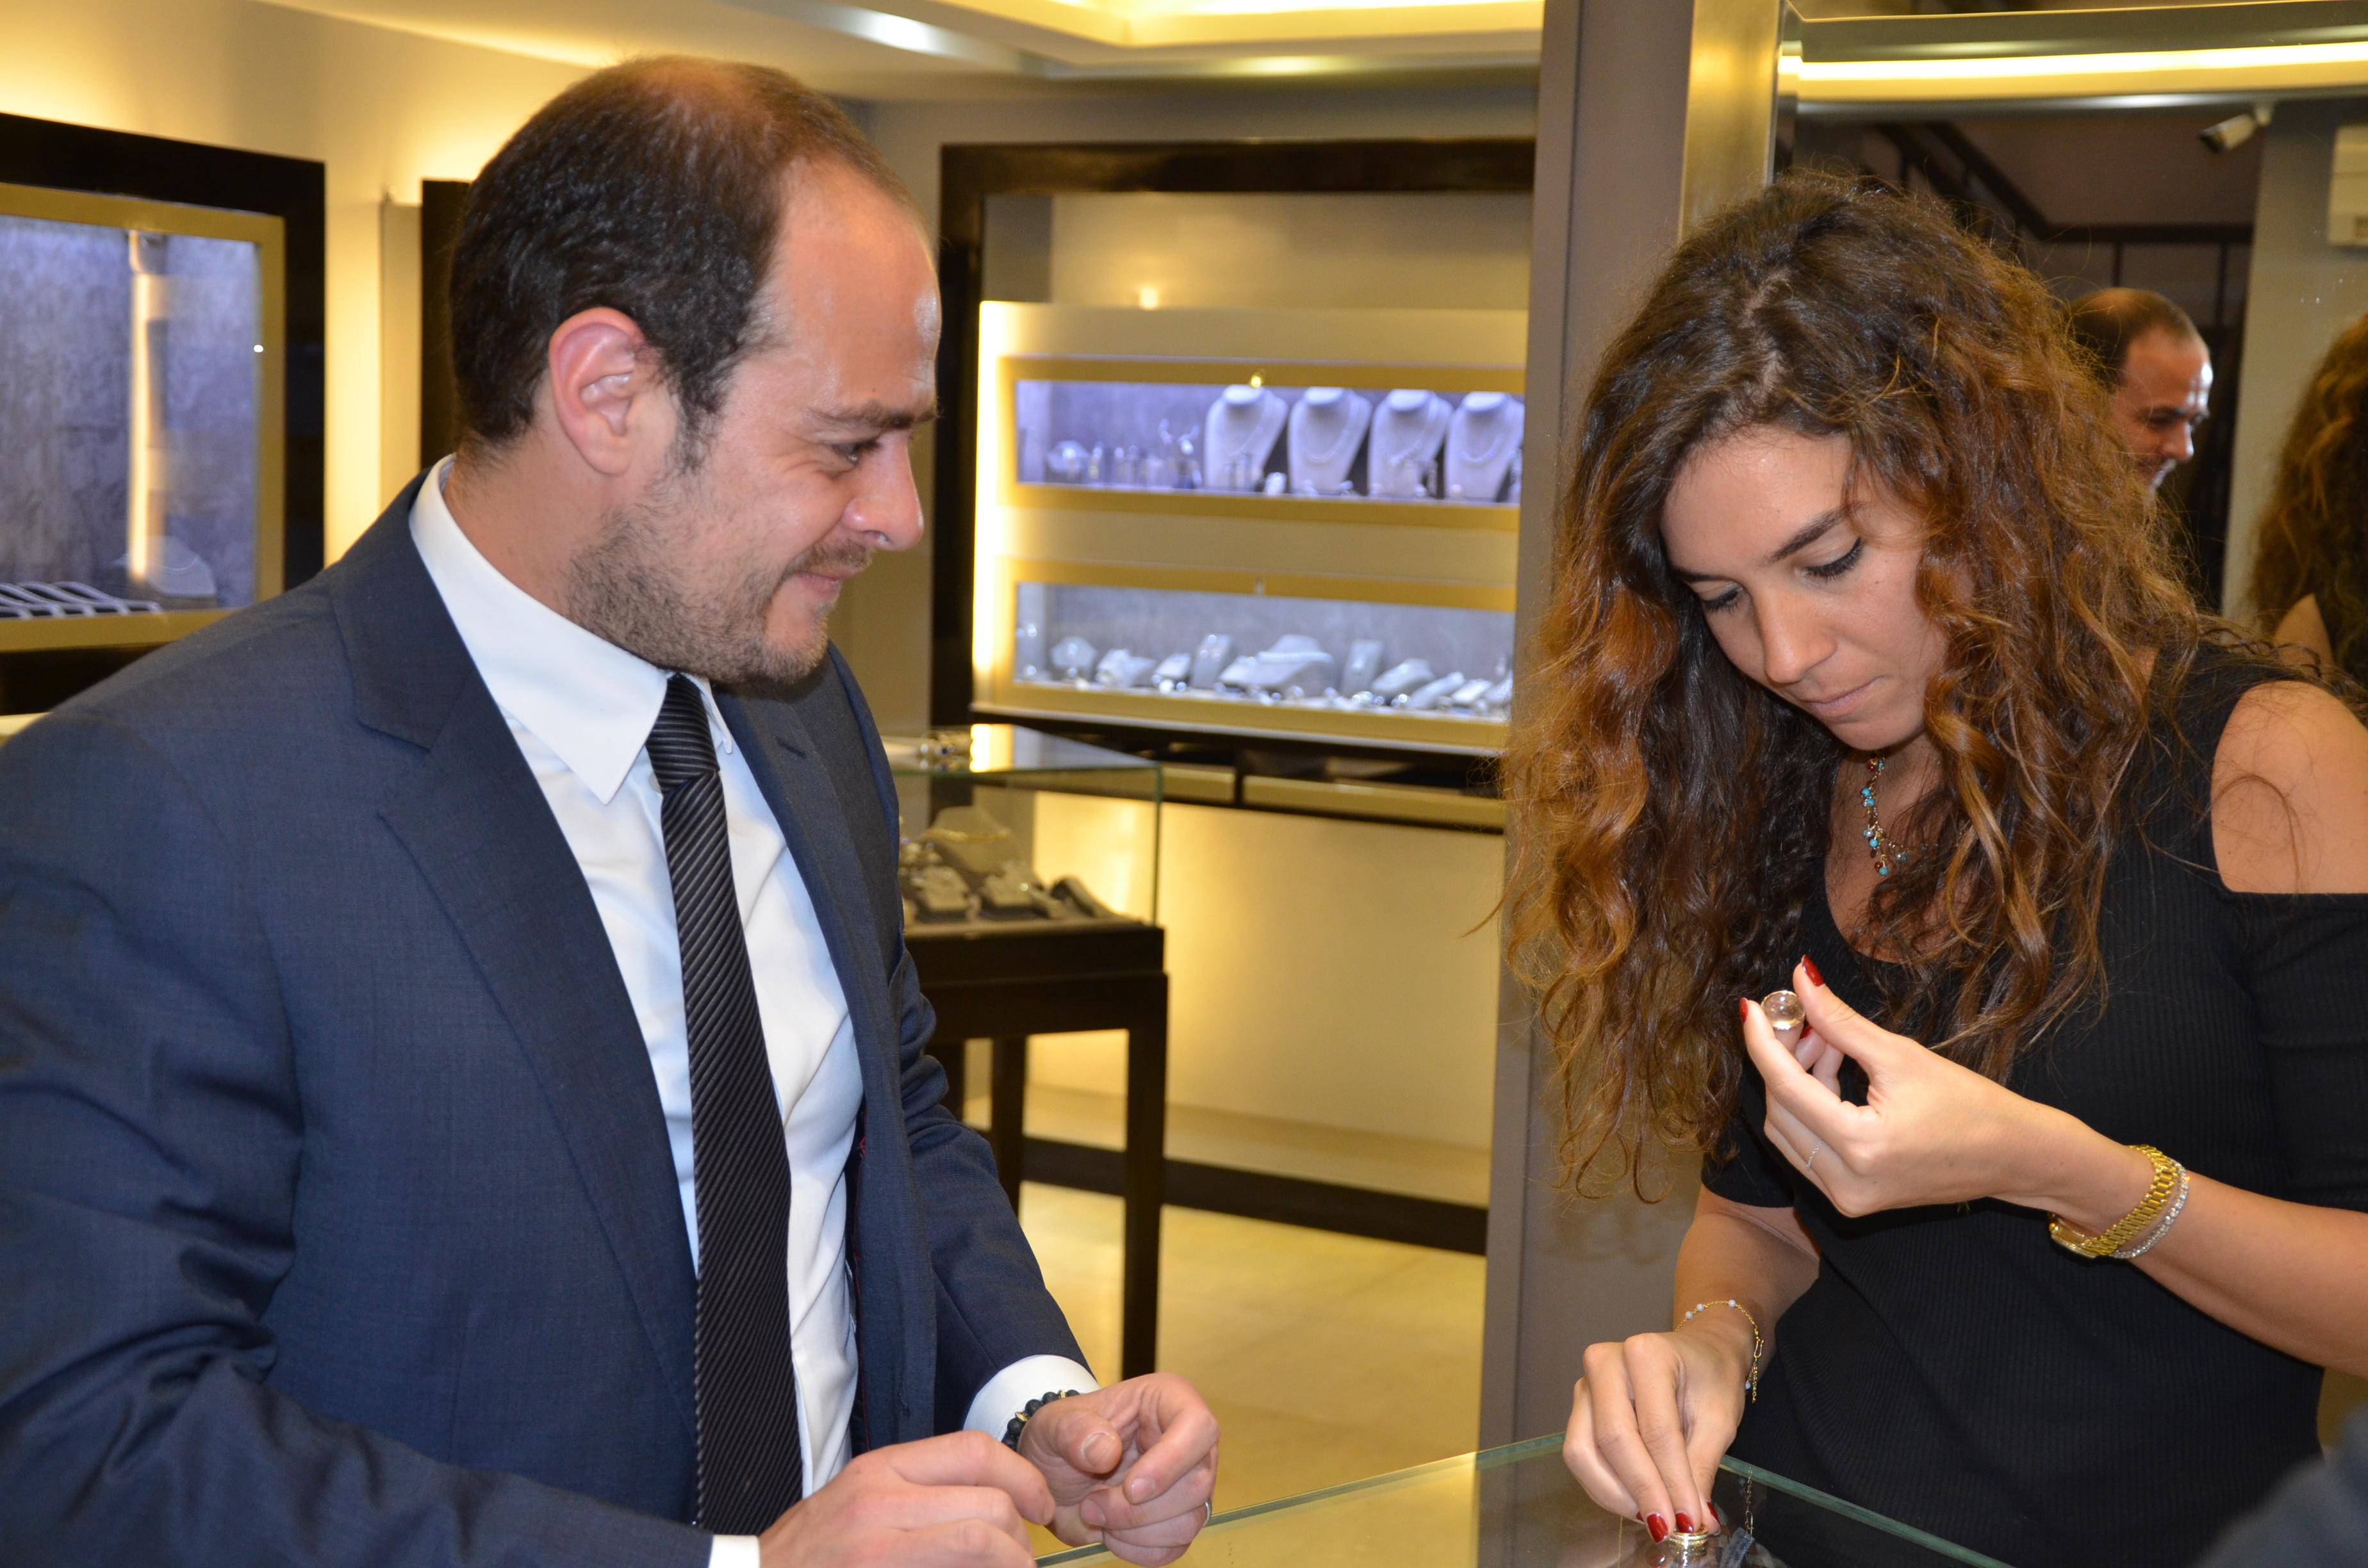 Mr. Mahmoud El Sirgany & Ms. Dima Abdel Meguid